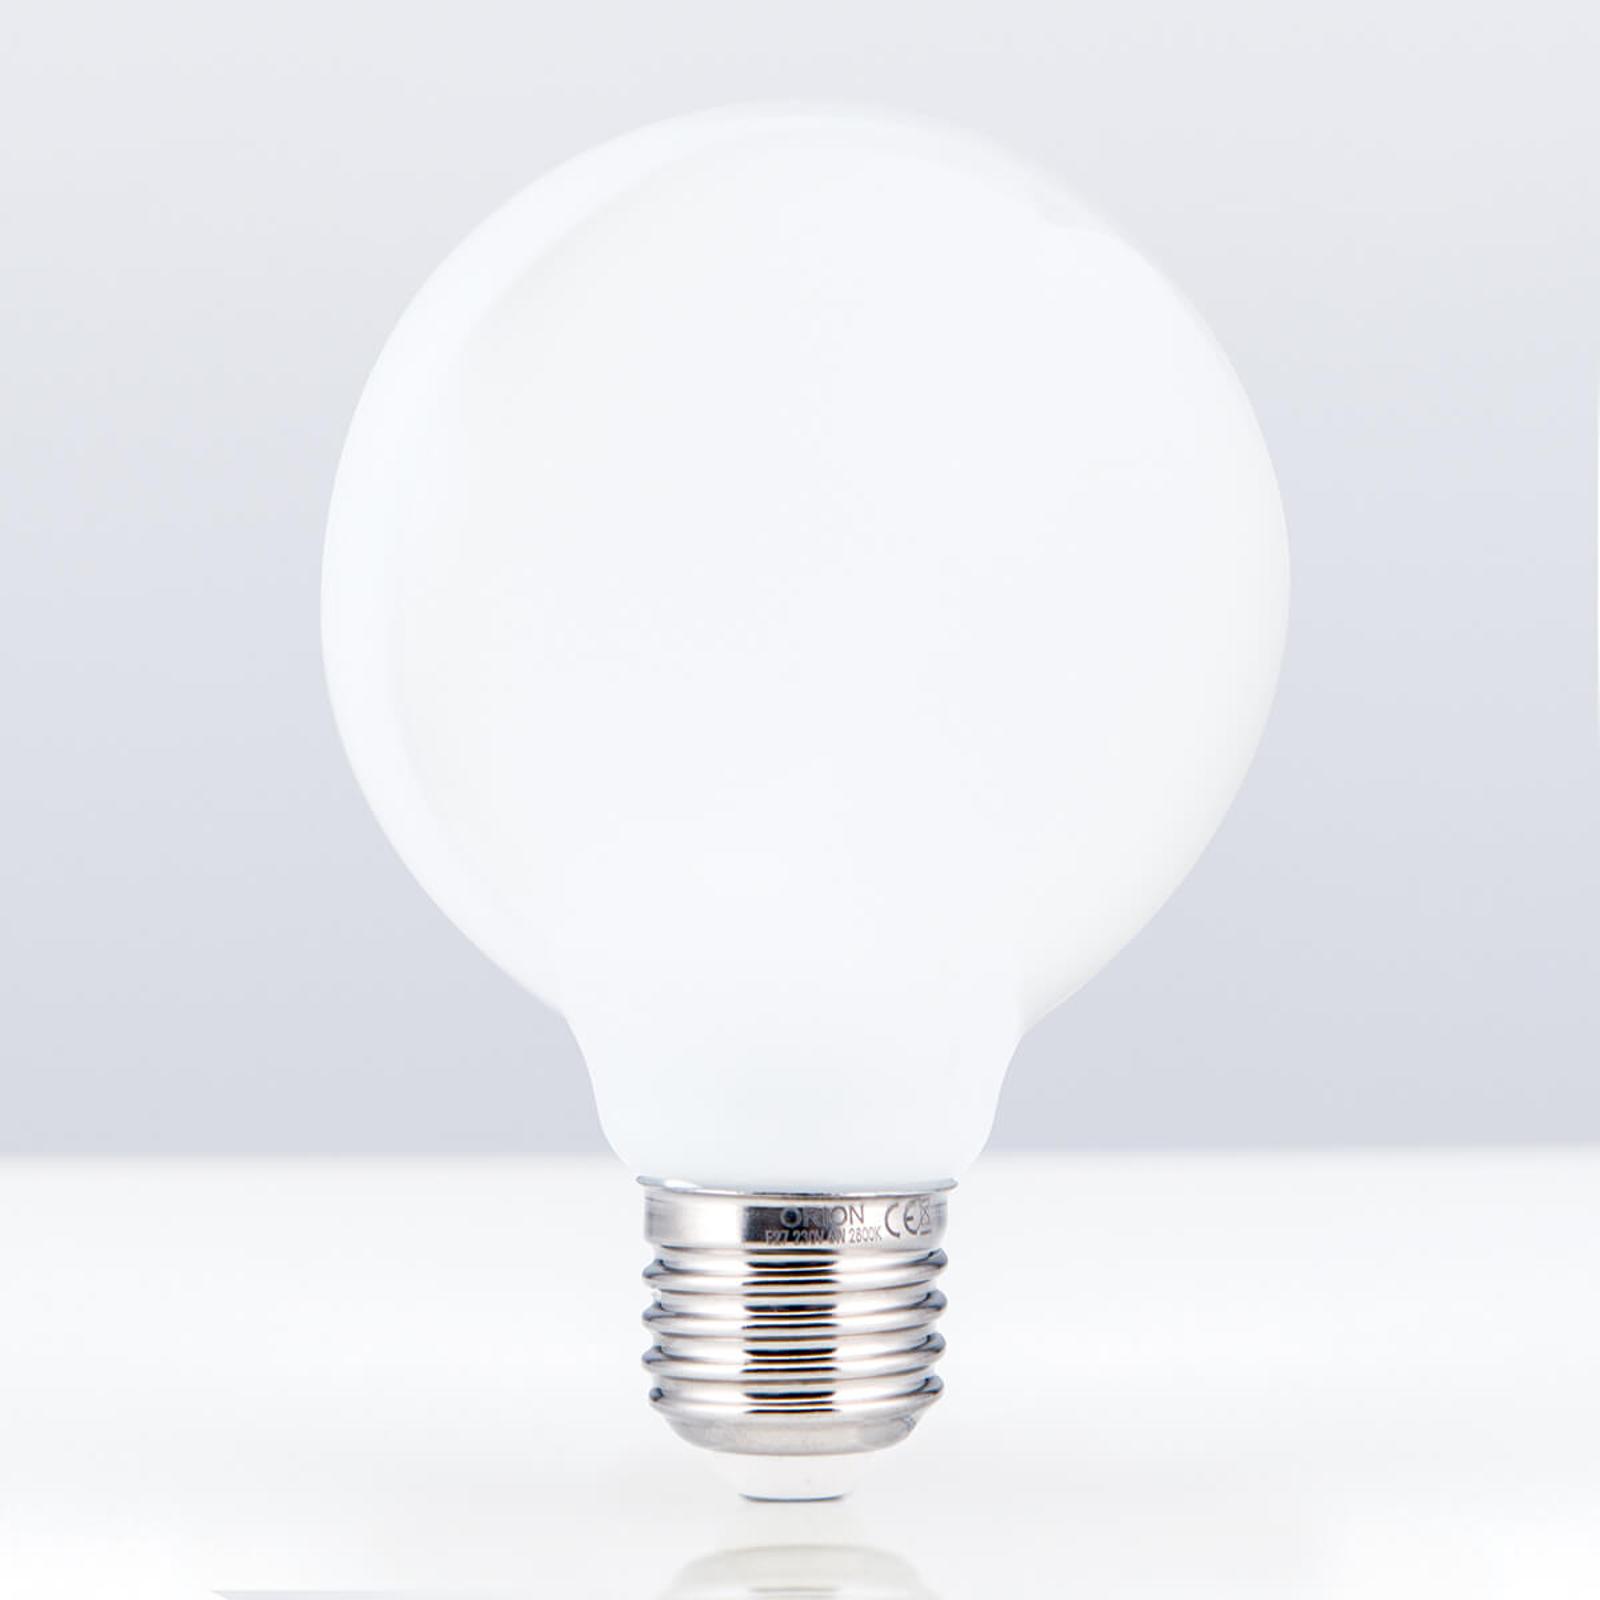 Ampoule globe LED E27 8W 828 G95opal